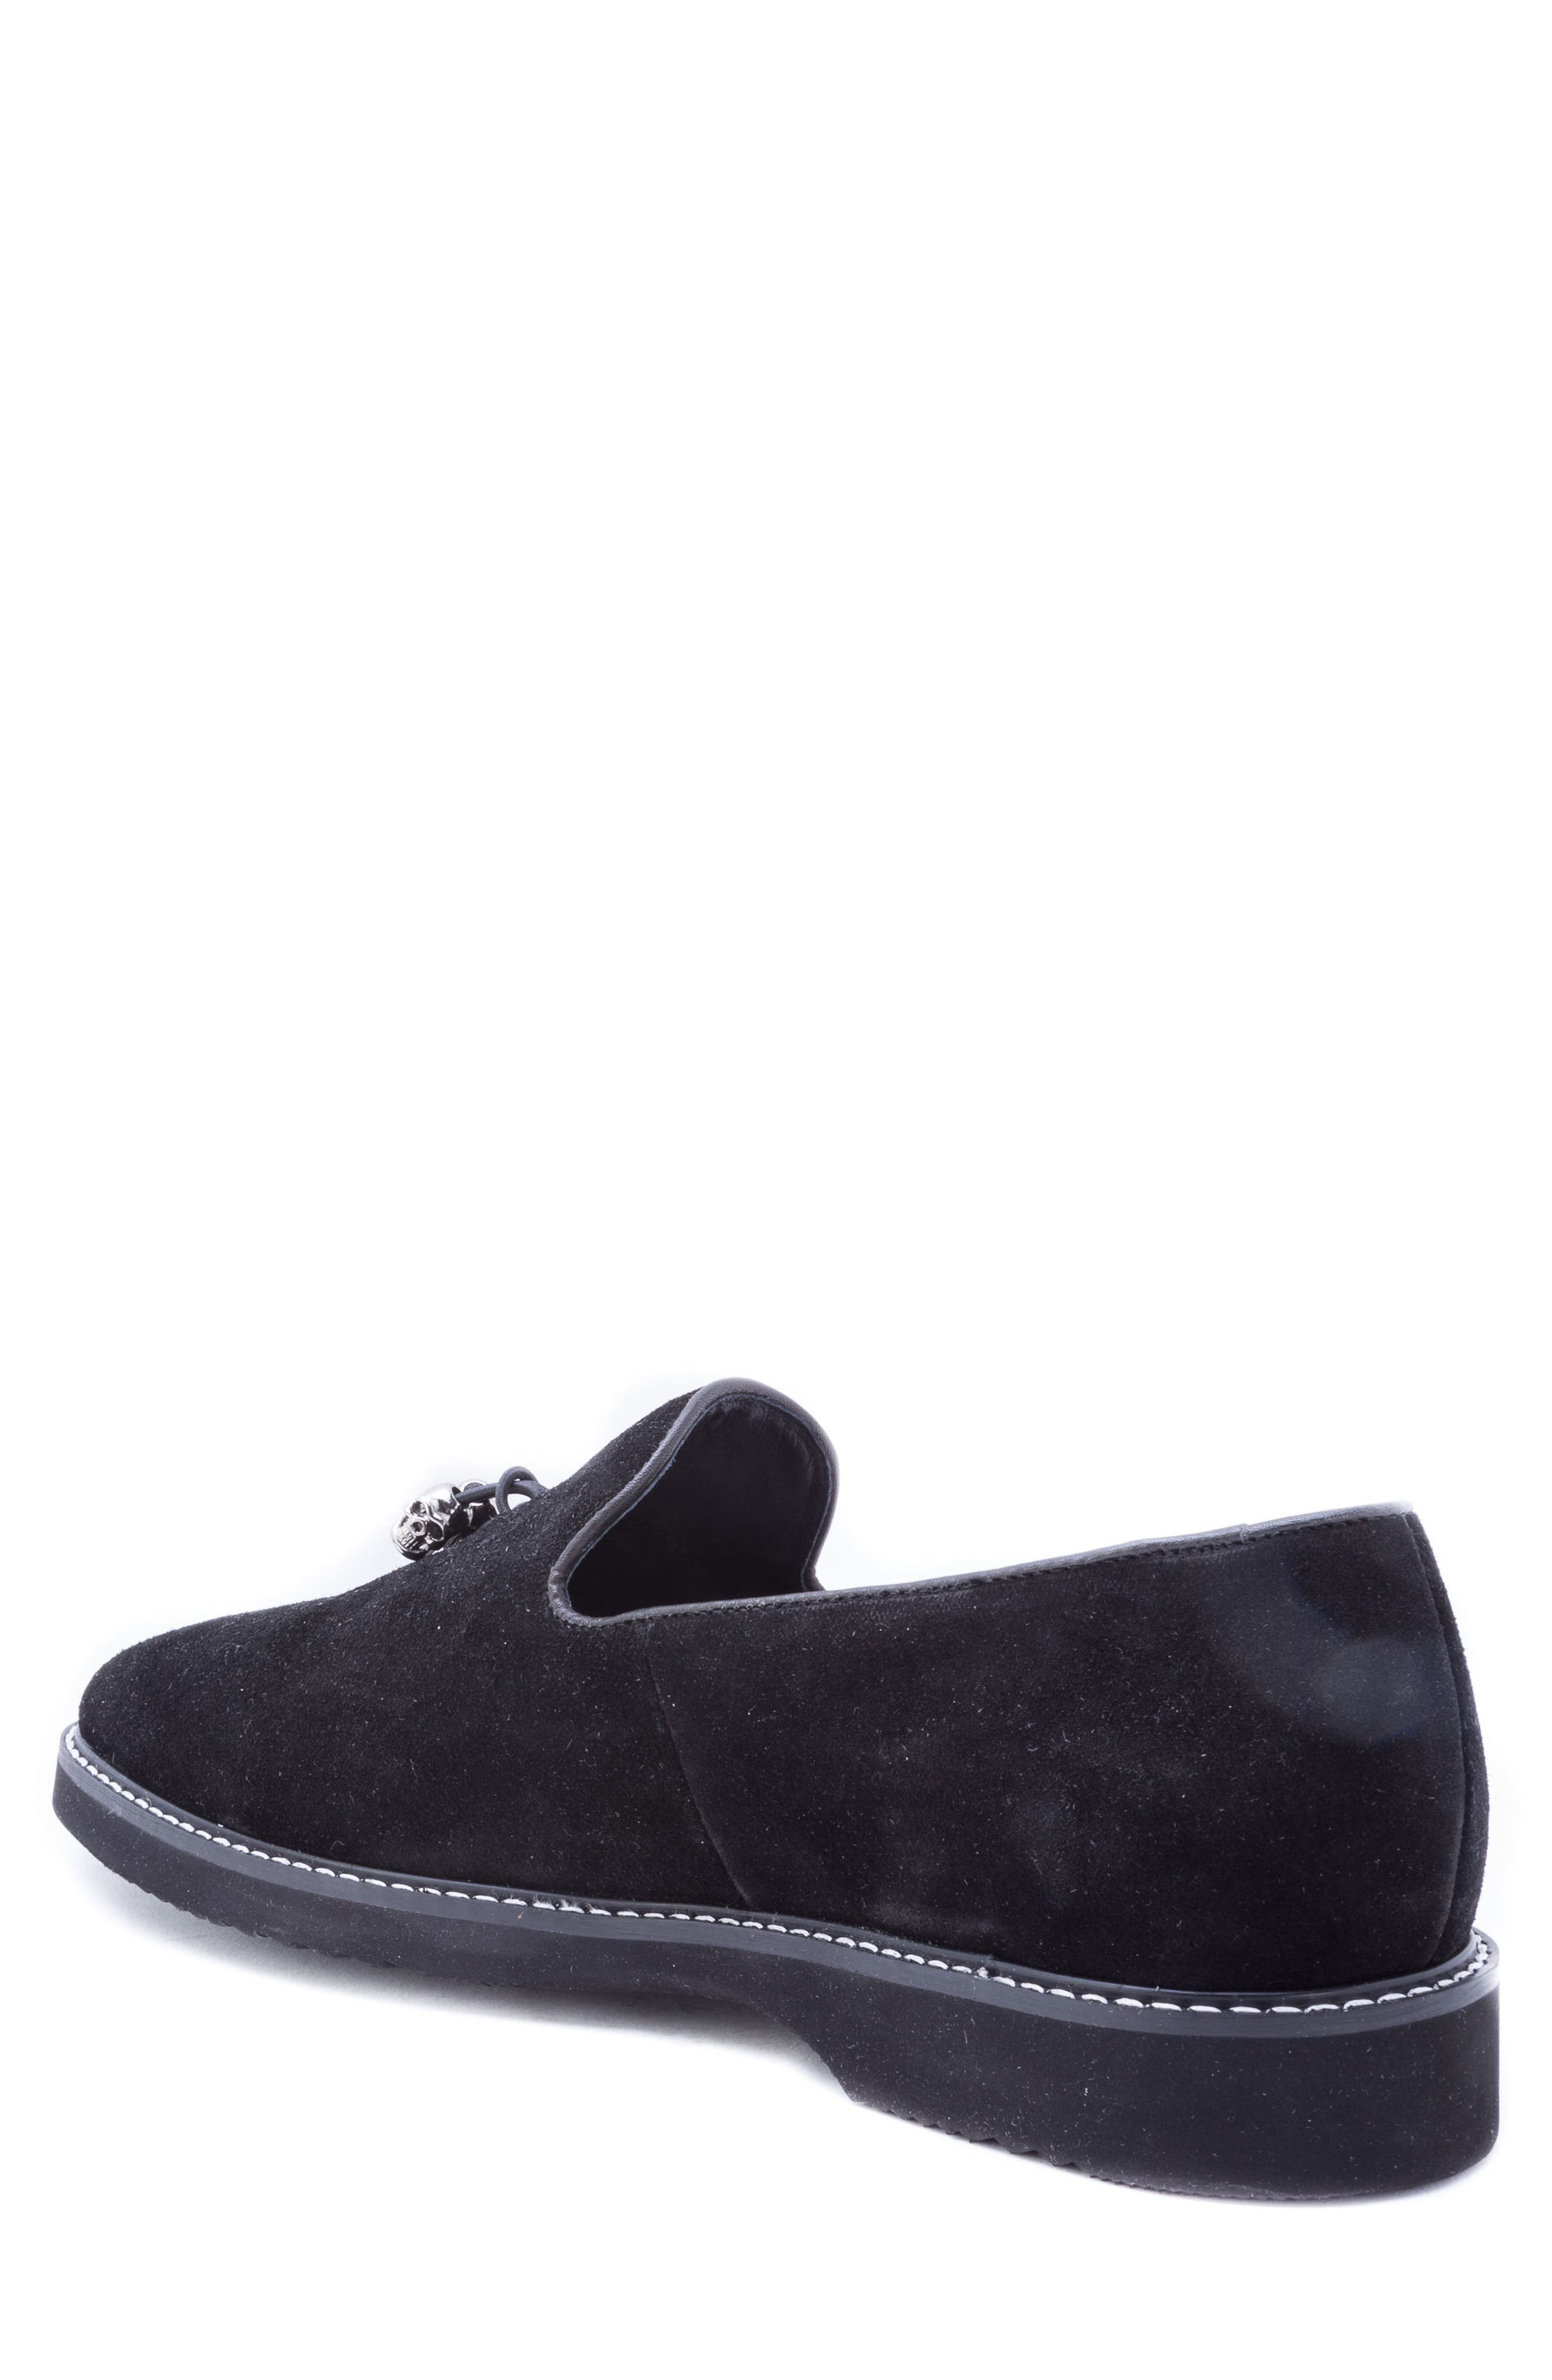 Heston Tassel Loafer,                             Alternate thumbnail 2, color,                             BLACK SUEDE